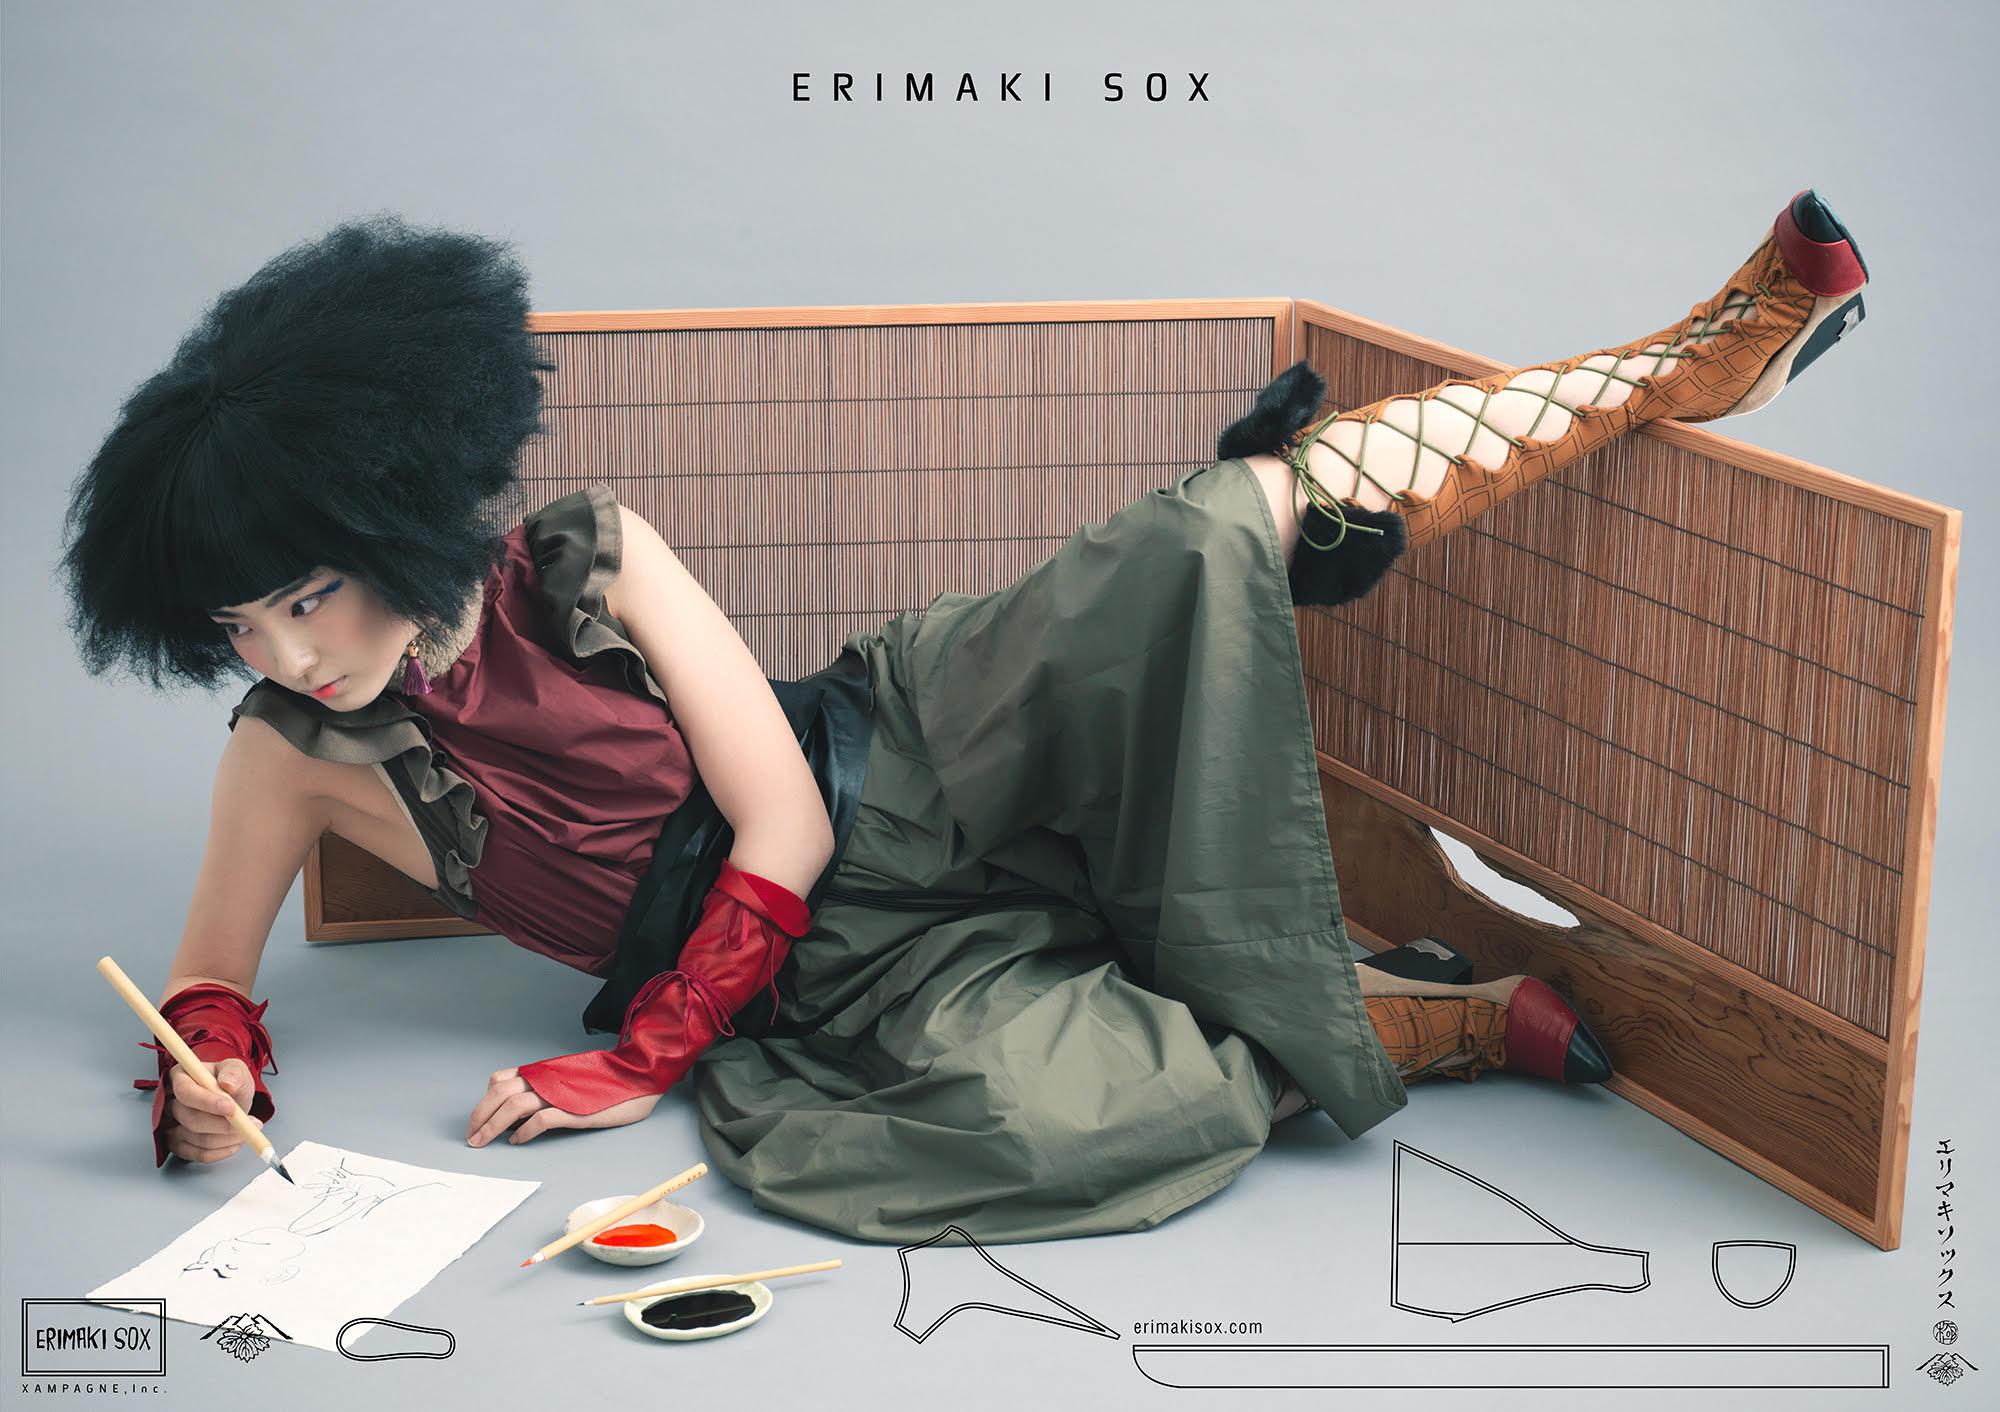 ERIMAKI SOX LIMITED VISUAL